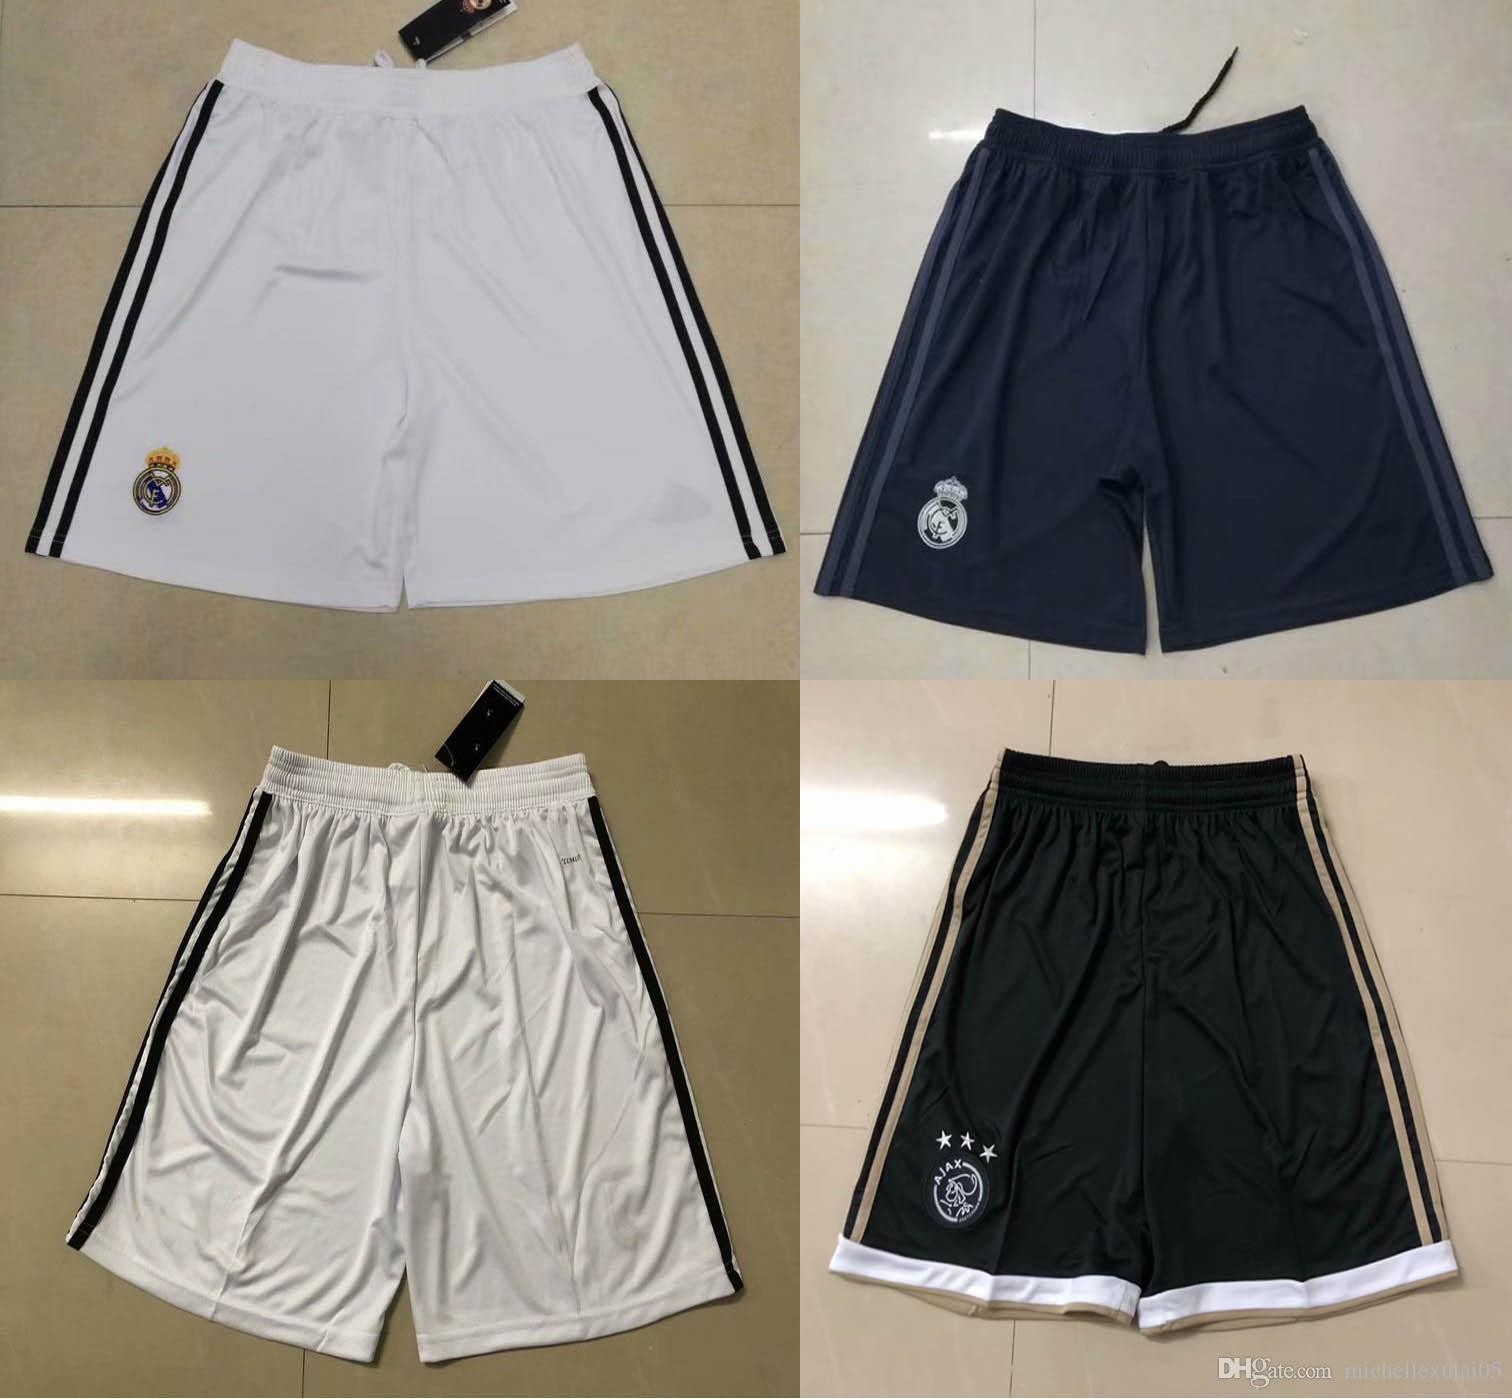 bd907656b76a96 2019 18 19 Real Madrid Home Away Third Soccer Shorts AJAX Football Pants  2018 2019 Adult Top Thai Quality Short Pants Mens Training Shorts From ...